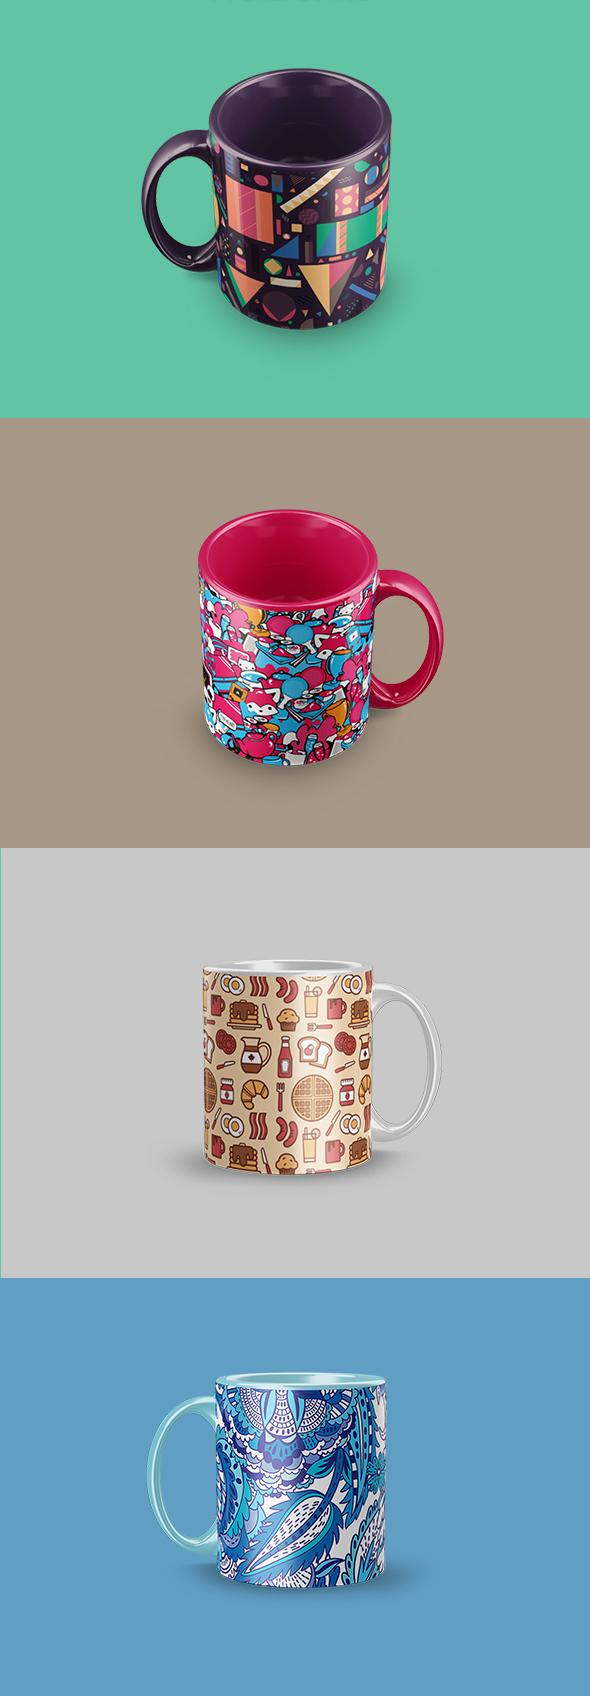 Mug  mug mockup Mockup mock-up mock up design Show free psd